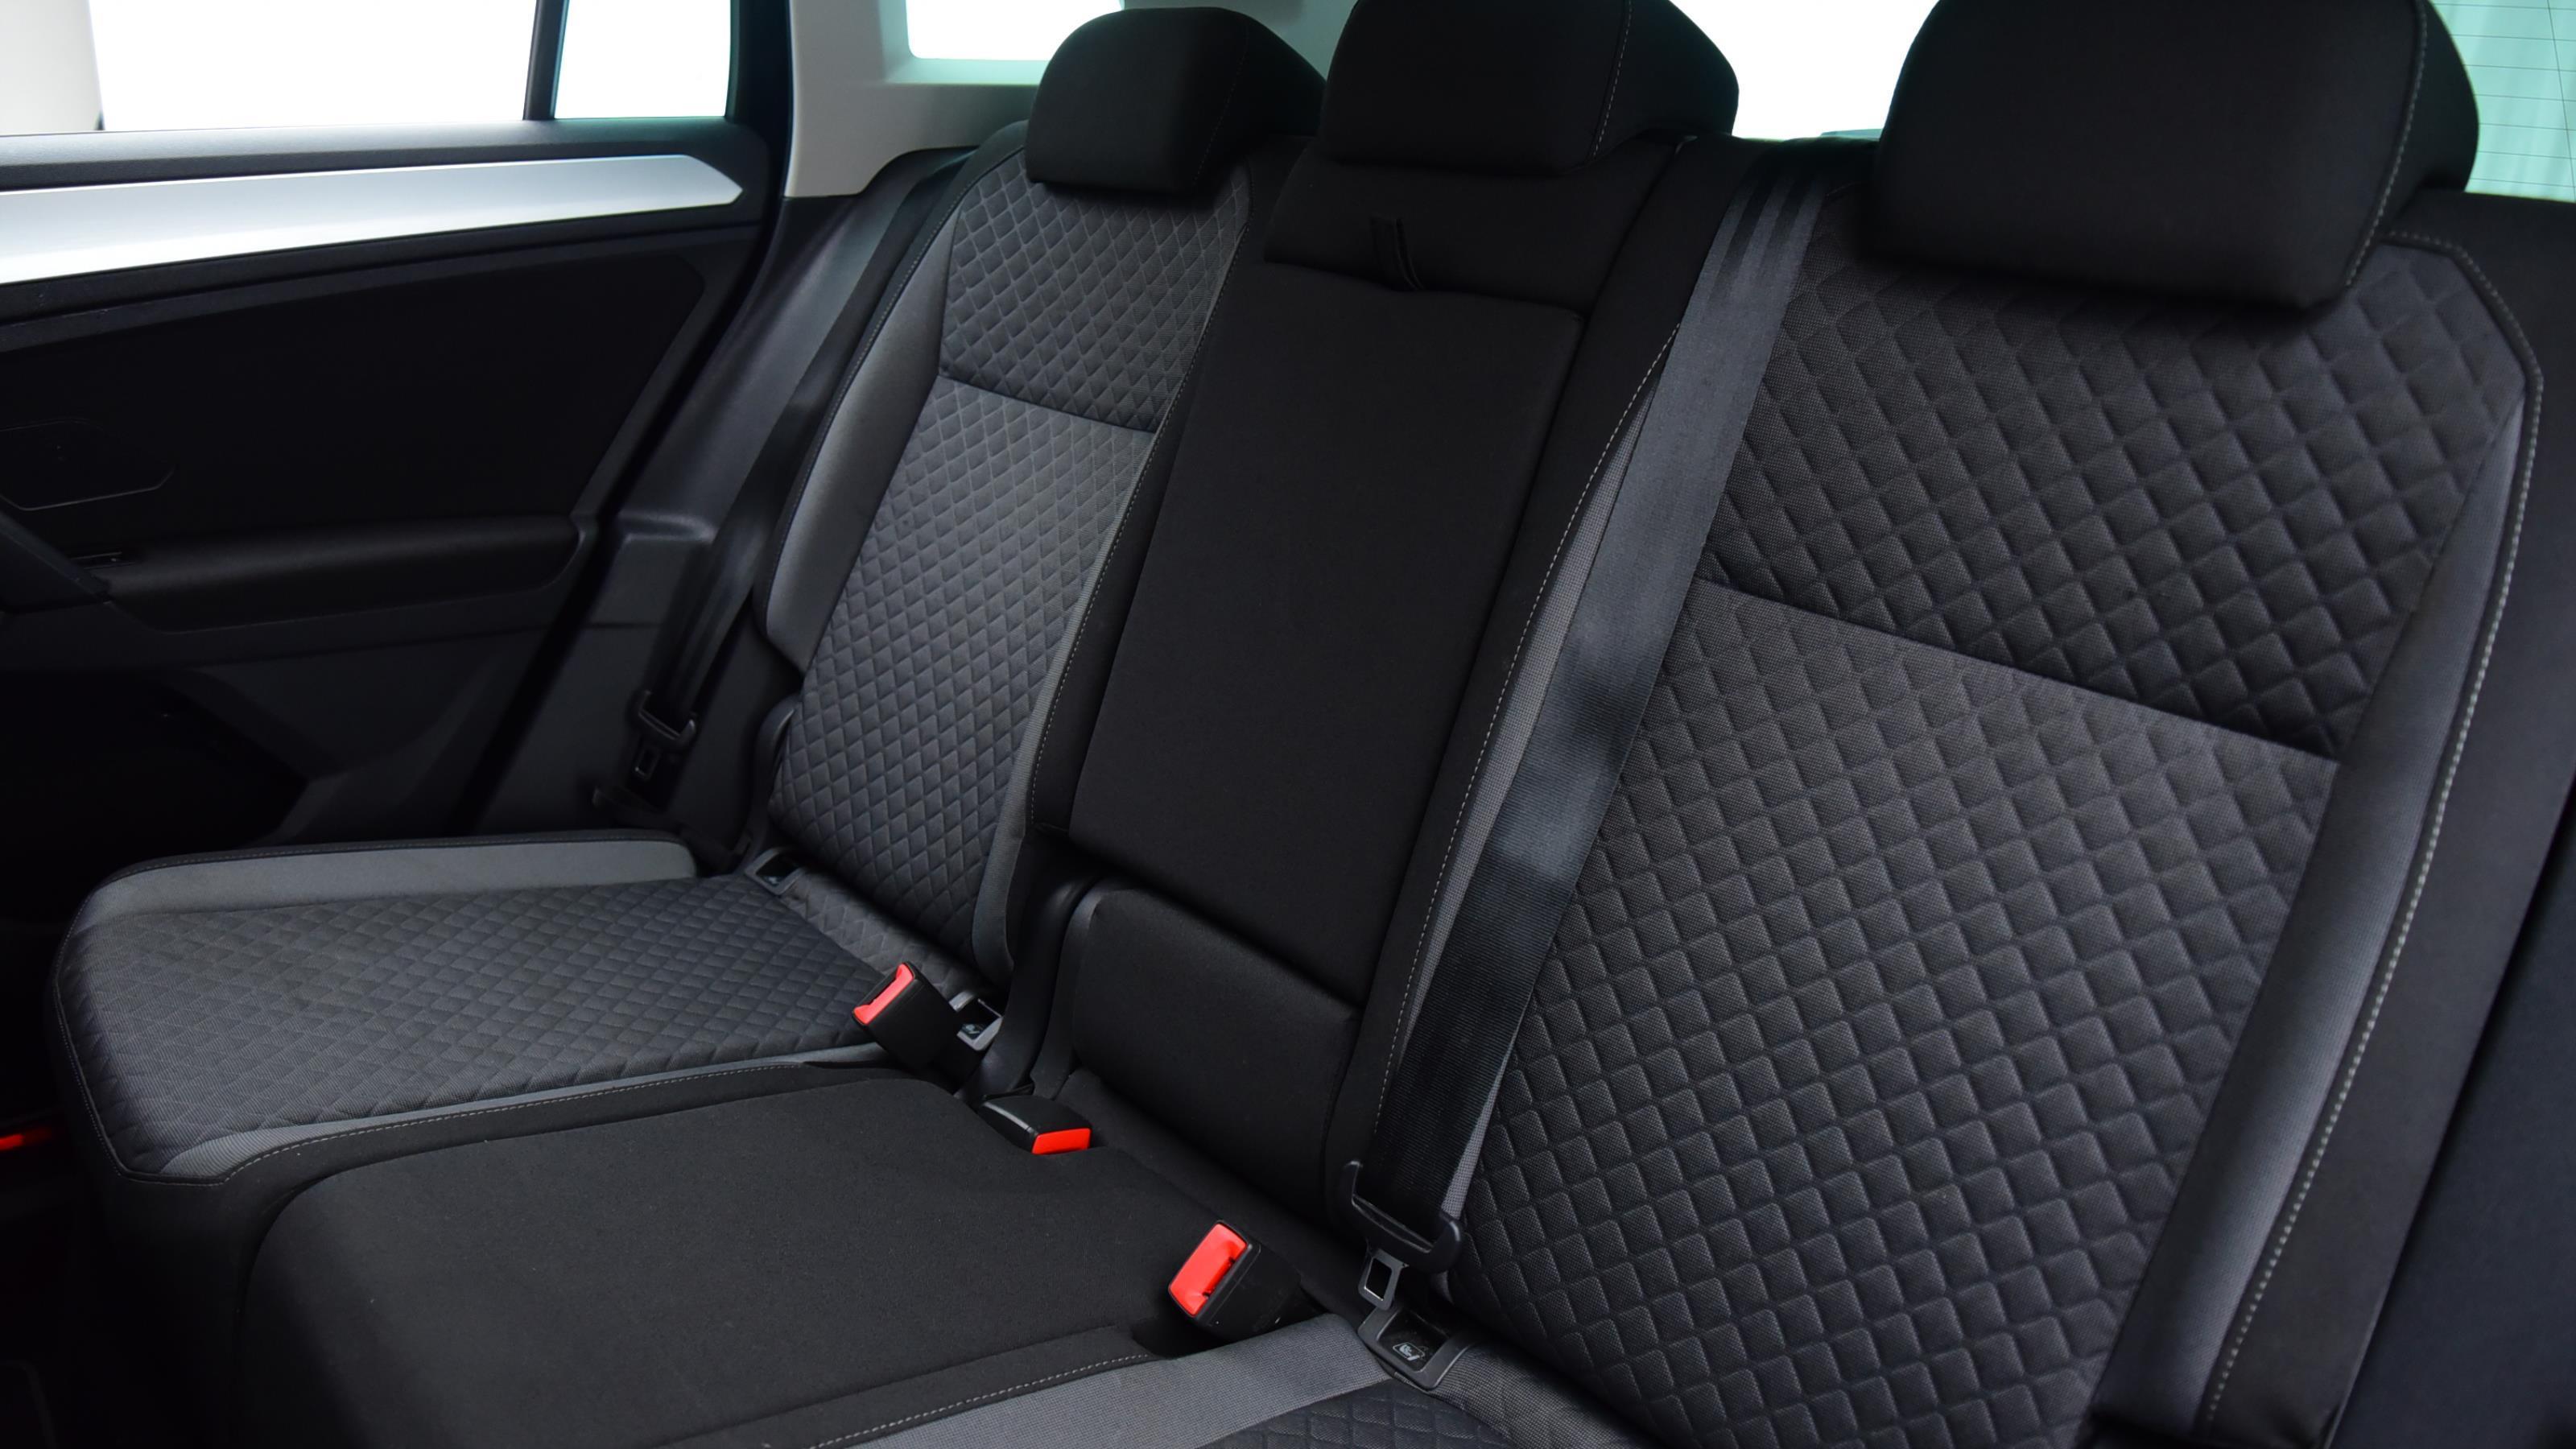 Used 16 Volkswagen TIGUAN 2.0 TDi 190 4Motion SE Nav 5dr DSG Green at Saxton4x4